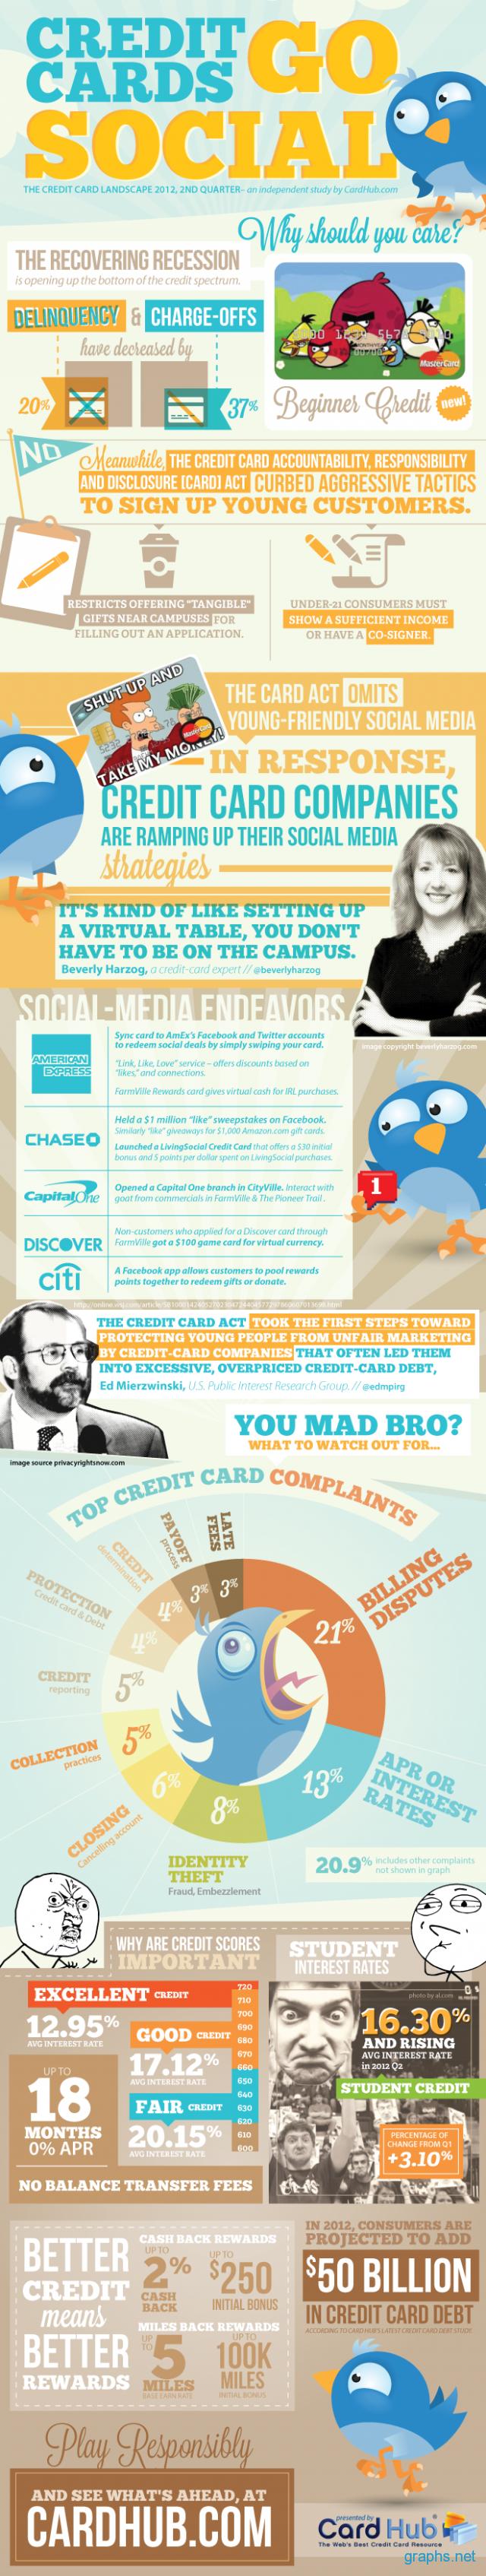 Social Credit Cards